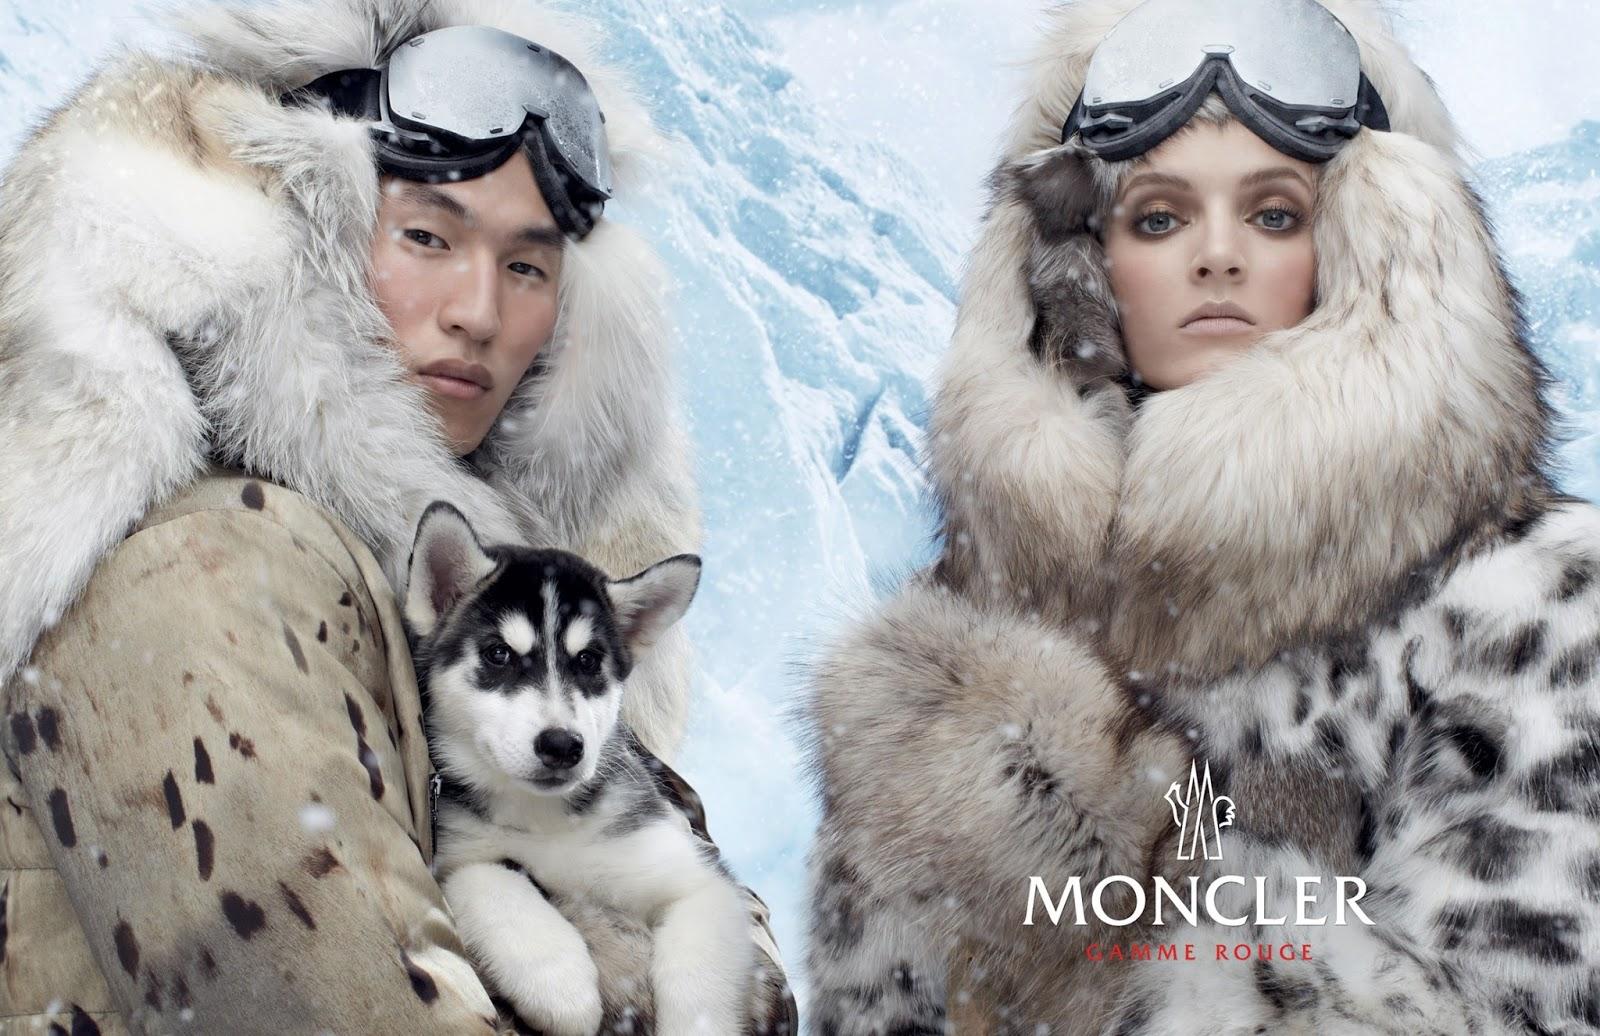 moncler ad